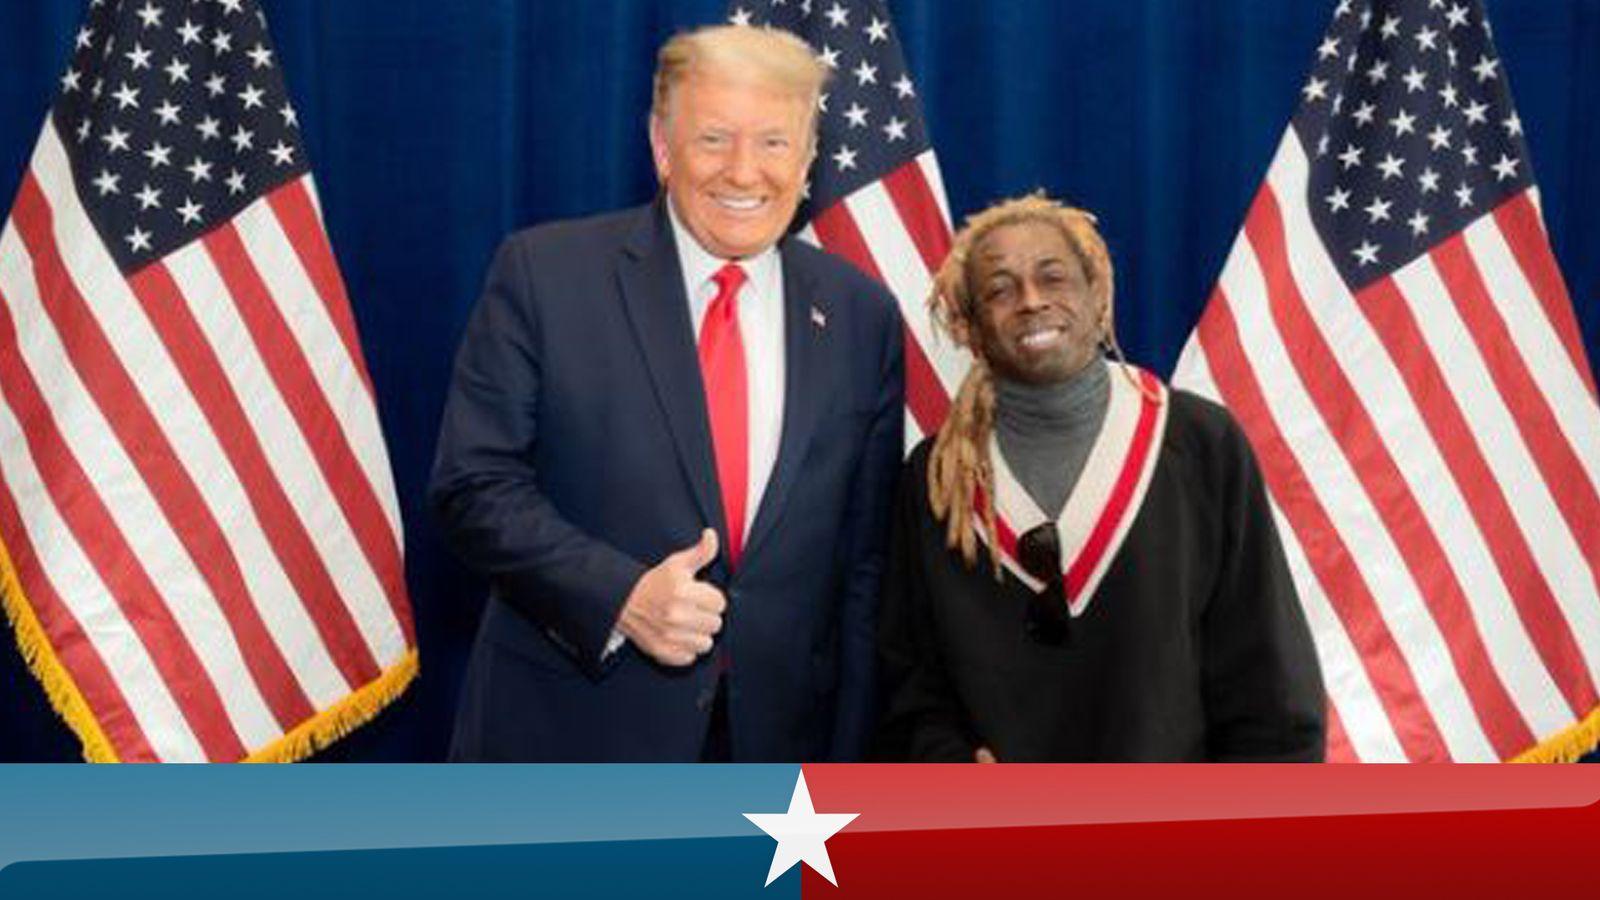 US election 2020: Rapper Lil Wayne endorses Donald Trump and backs 'platinum plan'